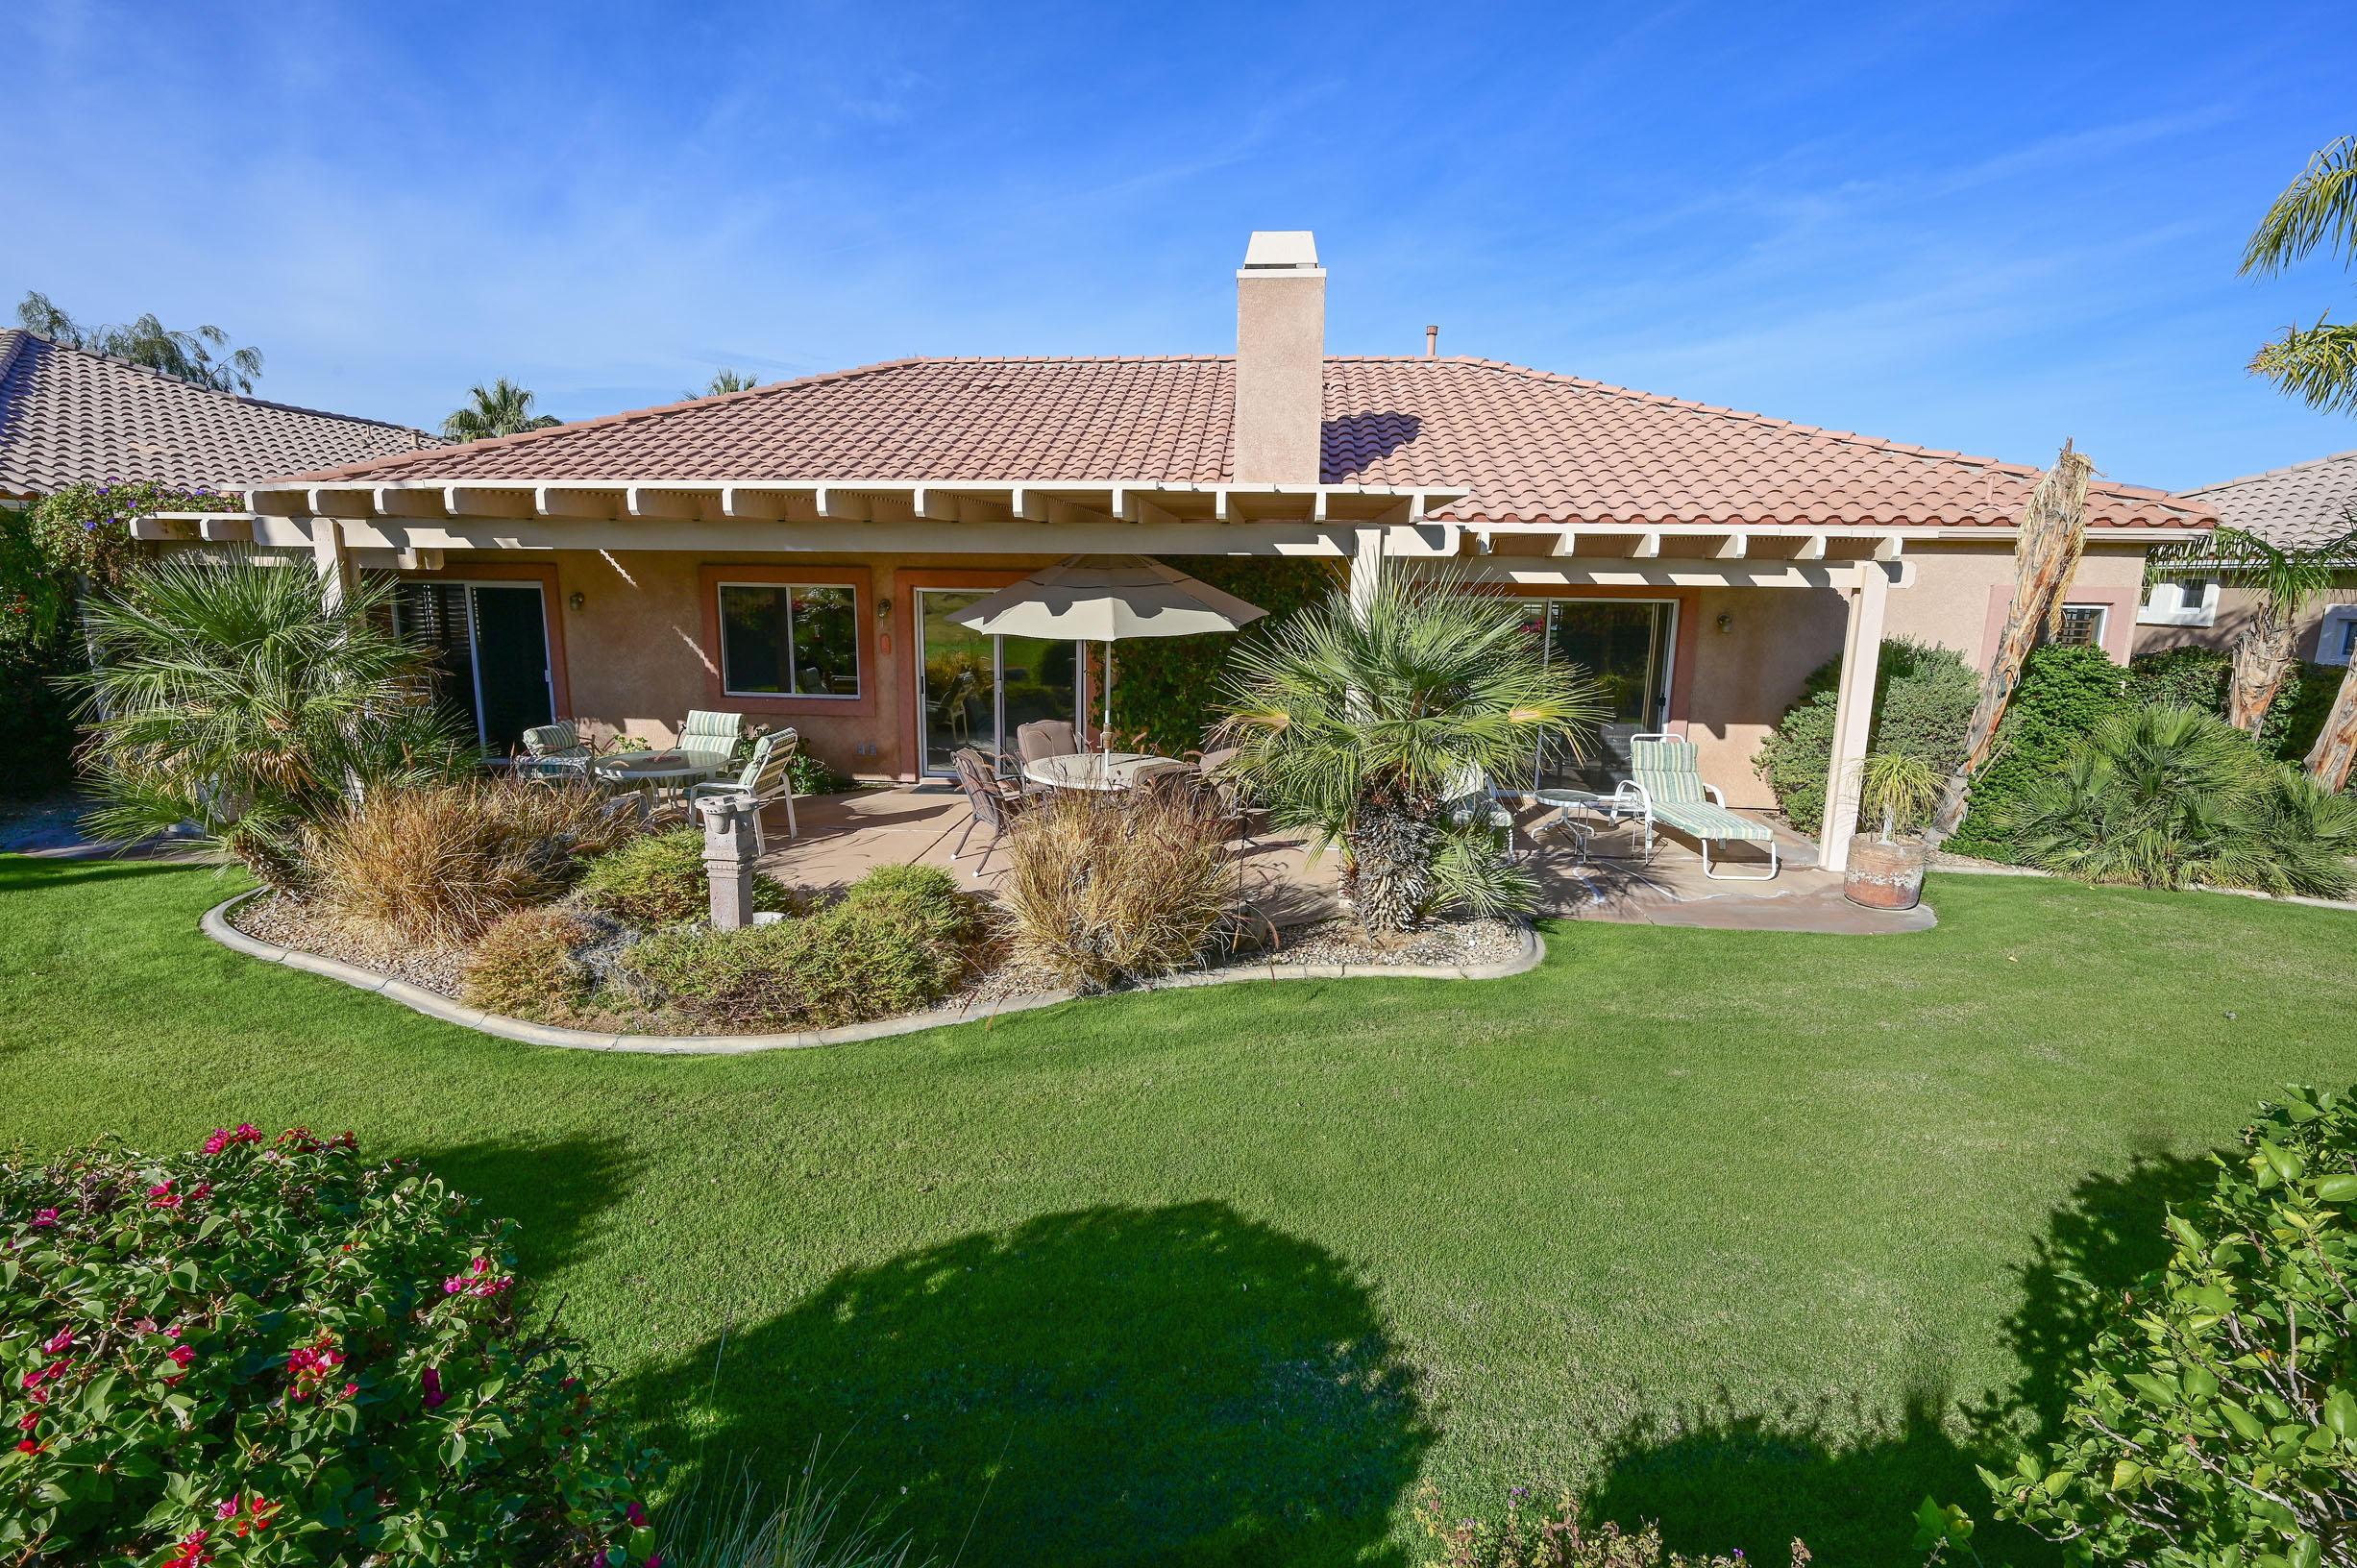 Photo of 80281 Green Hills Drive, Indio, CA 92201